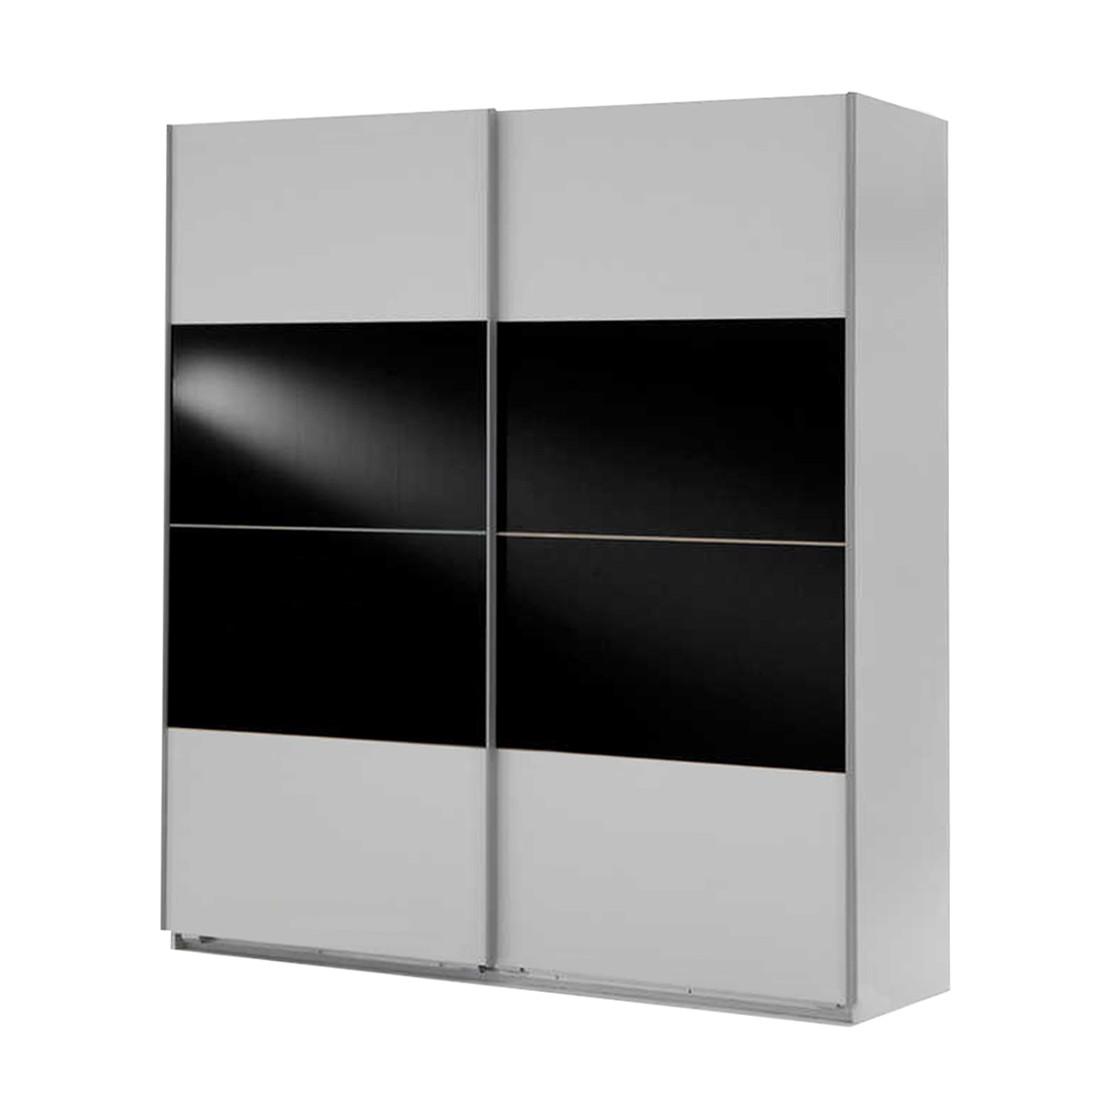 schwebet renschrank kingston c alpinwei schwarzglas. Black Bedroom Furniture Sets. Home Design Ideas